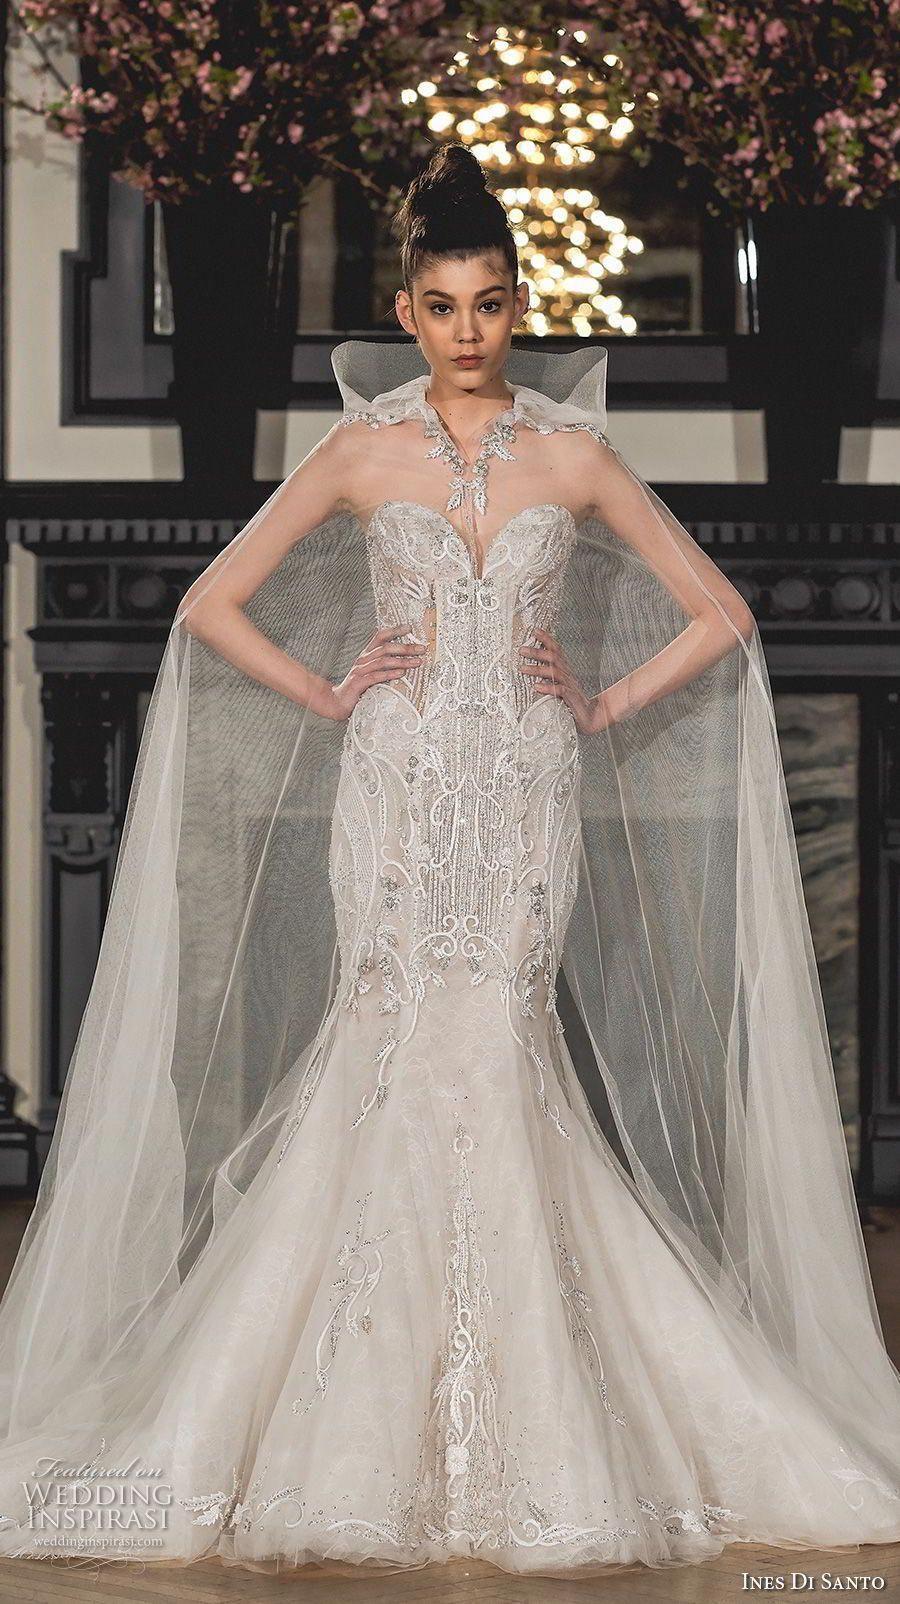 Ines di santo spring bridal strapless sweetheart neckline full